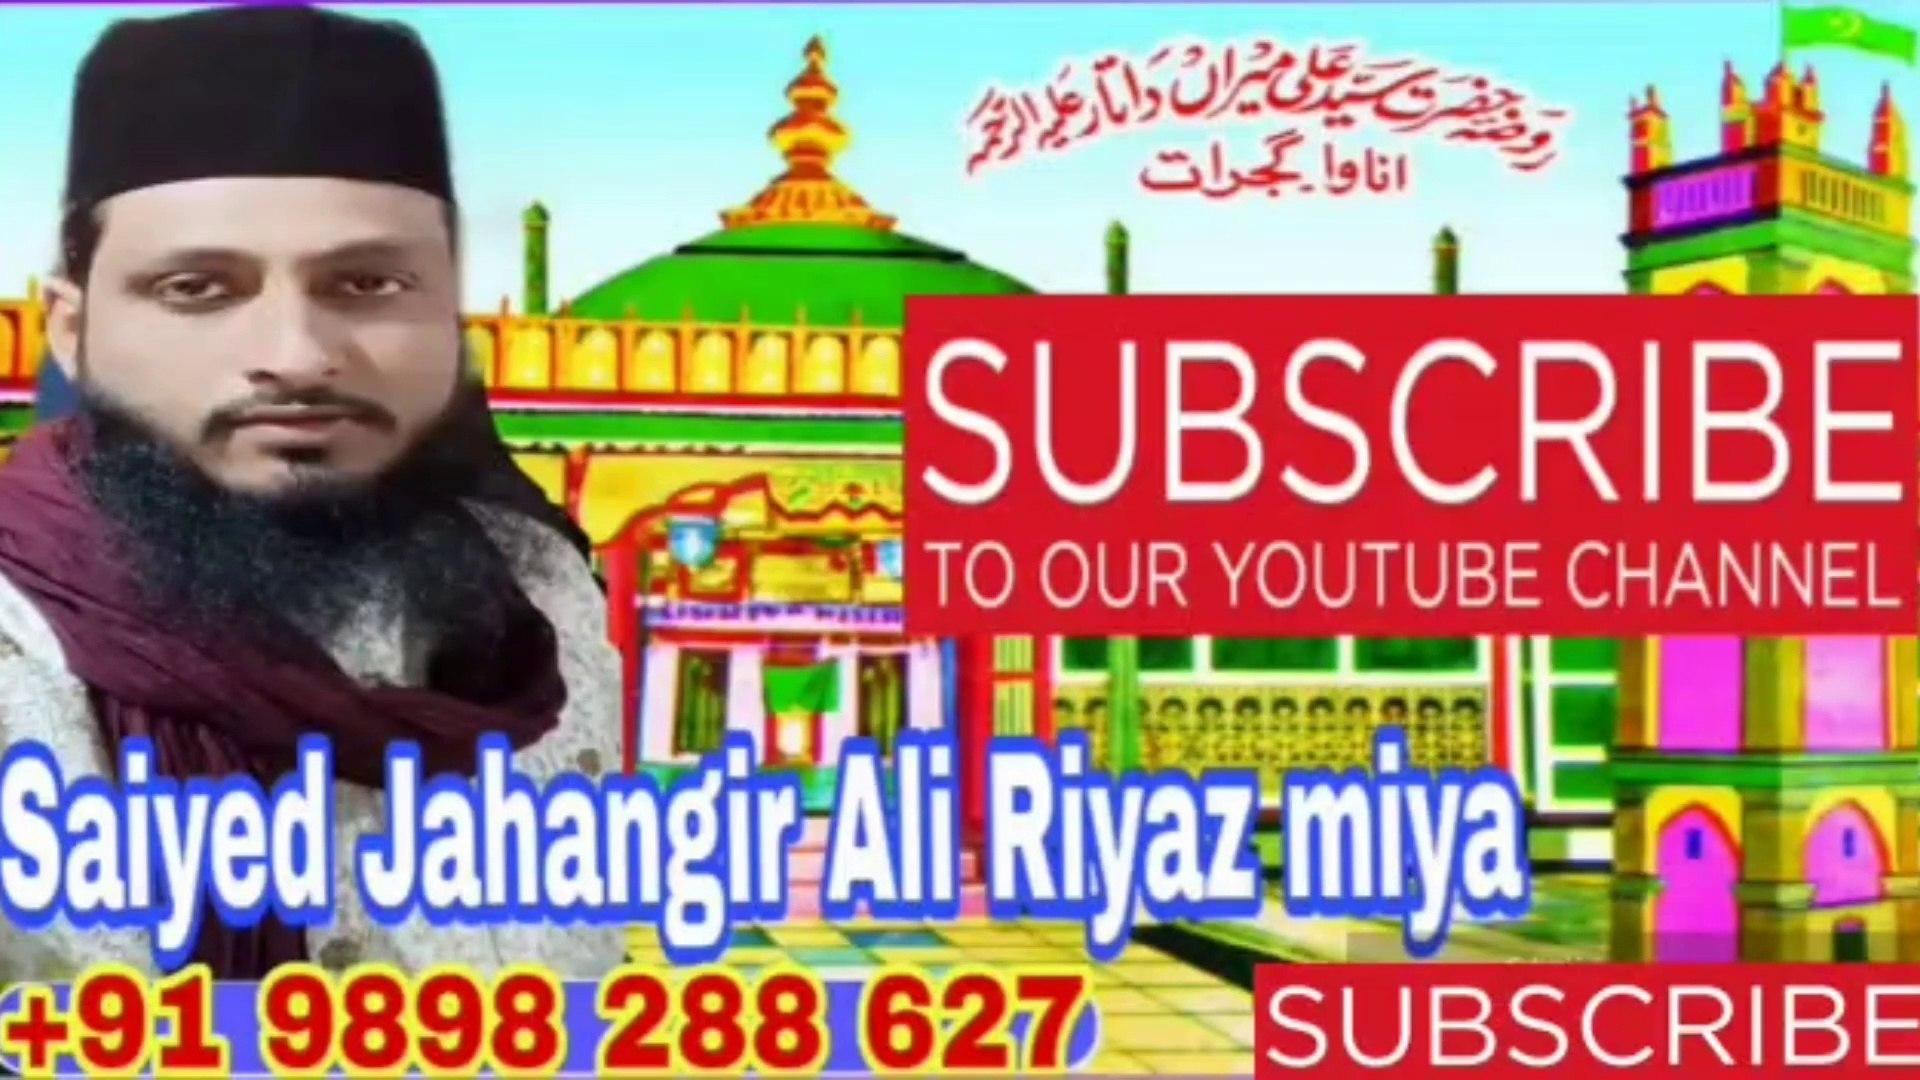 Mira Datar Dargah Sharif Unava Unjah Gujarat India New Qawwali Song Khadim Saiyed Amirhamzah Jahangirali Video Dailymotion